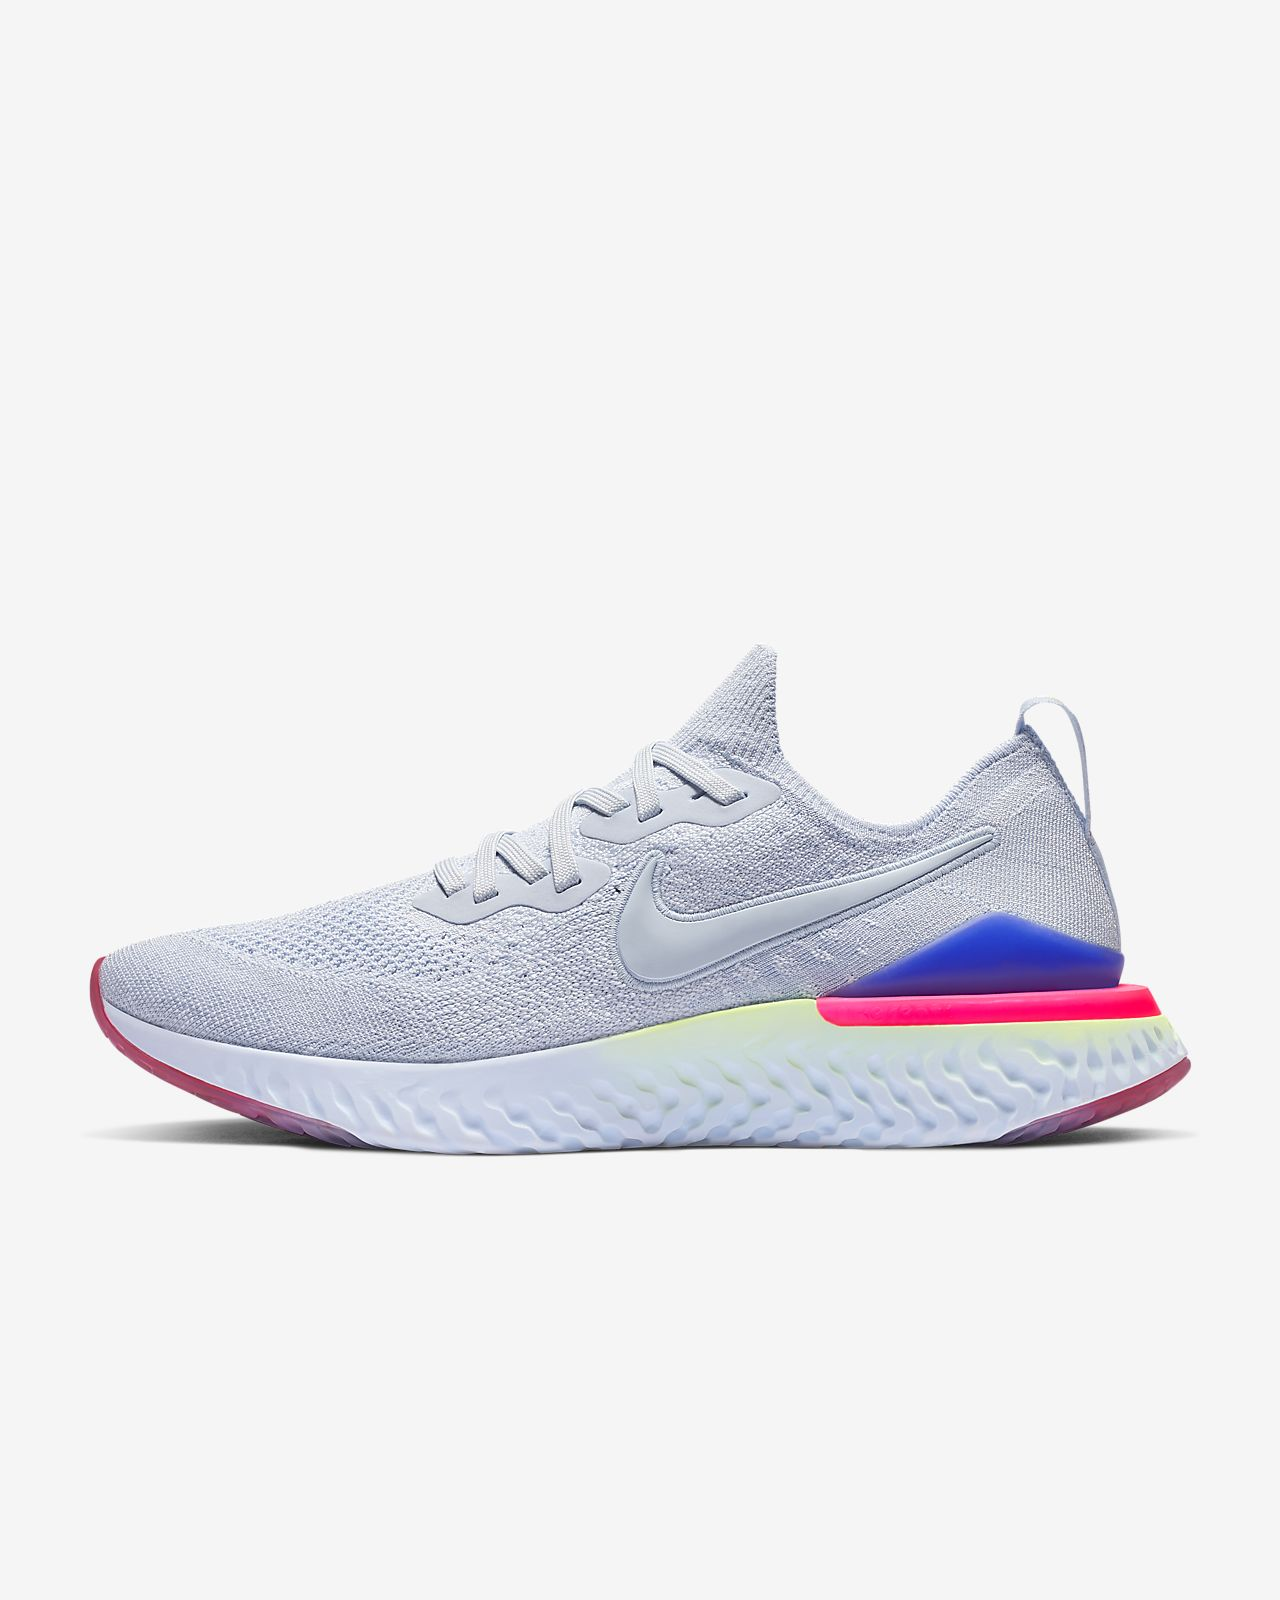 De Flyknit Nike Running Epic Femme Pour React Chaussure 2 wZ80ONkPXn